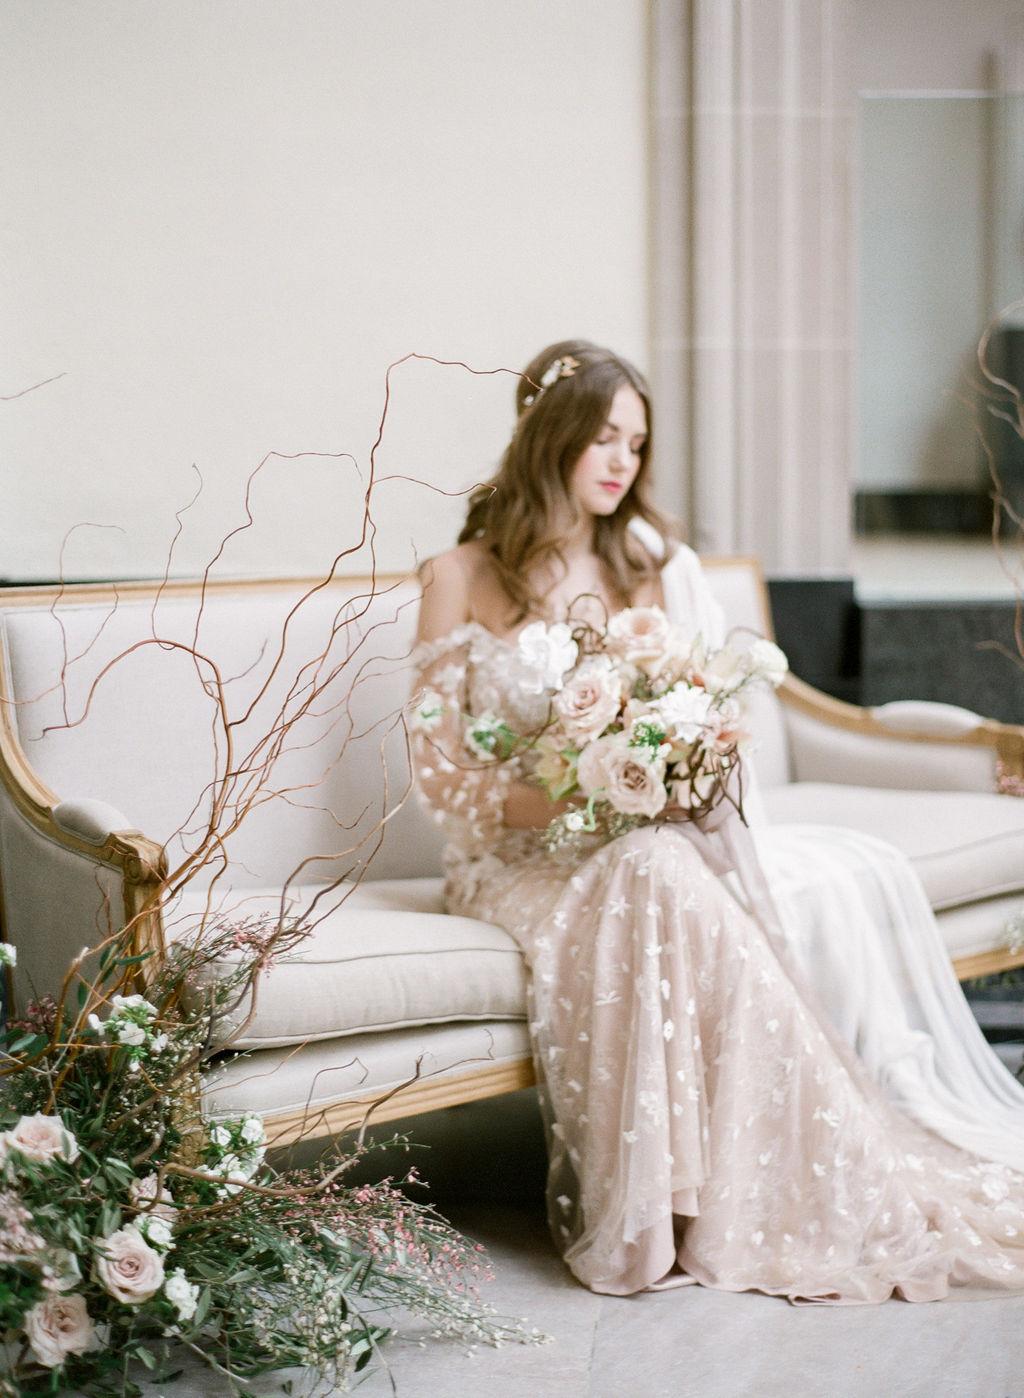 artiese-ago-wedding-editorial-000423680002.jpg